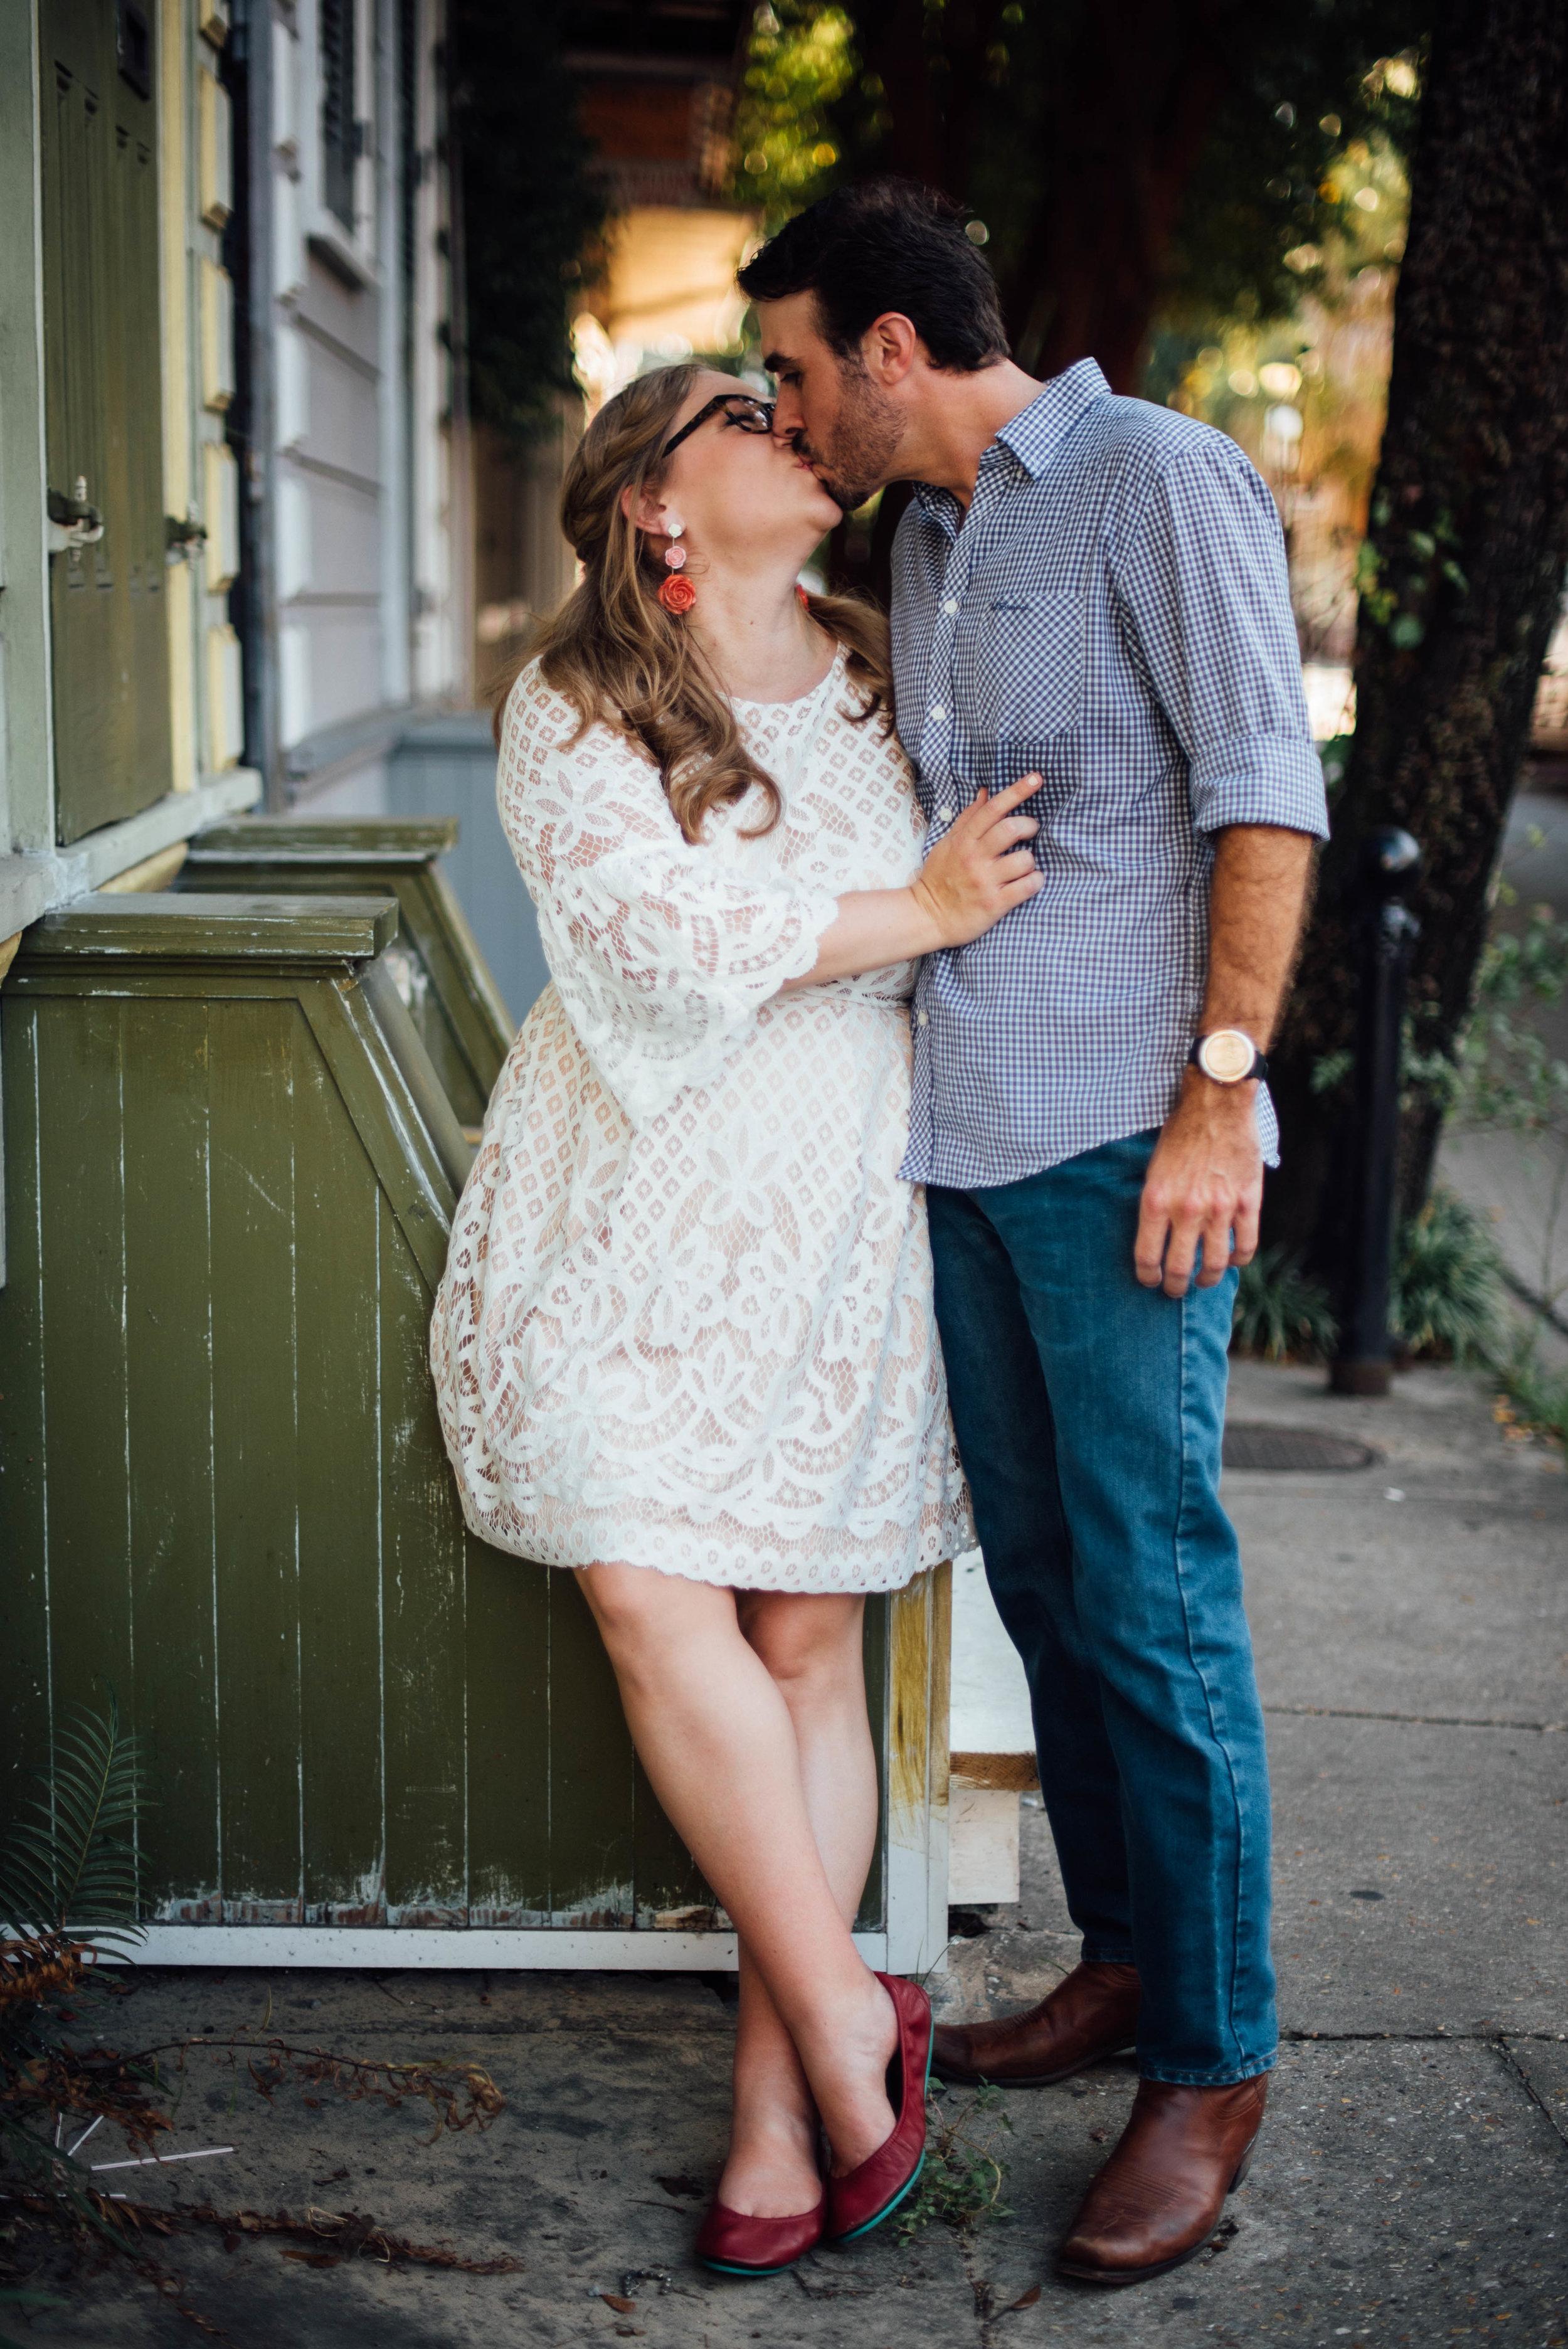 Jordan + Kent_French-Quarter-New-Orleans-City-Park-Engagement-Photos_Gabby Chapin_Print_0077.jpg